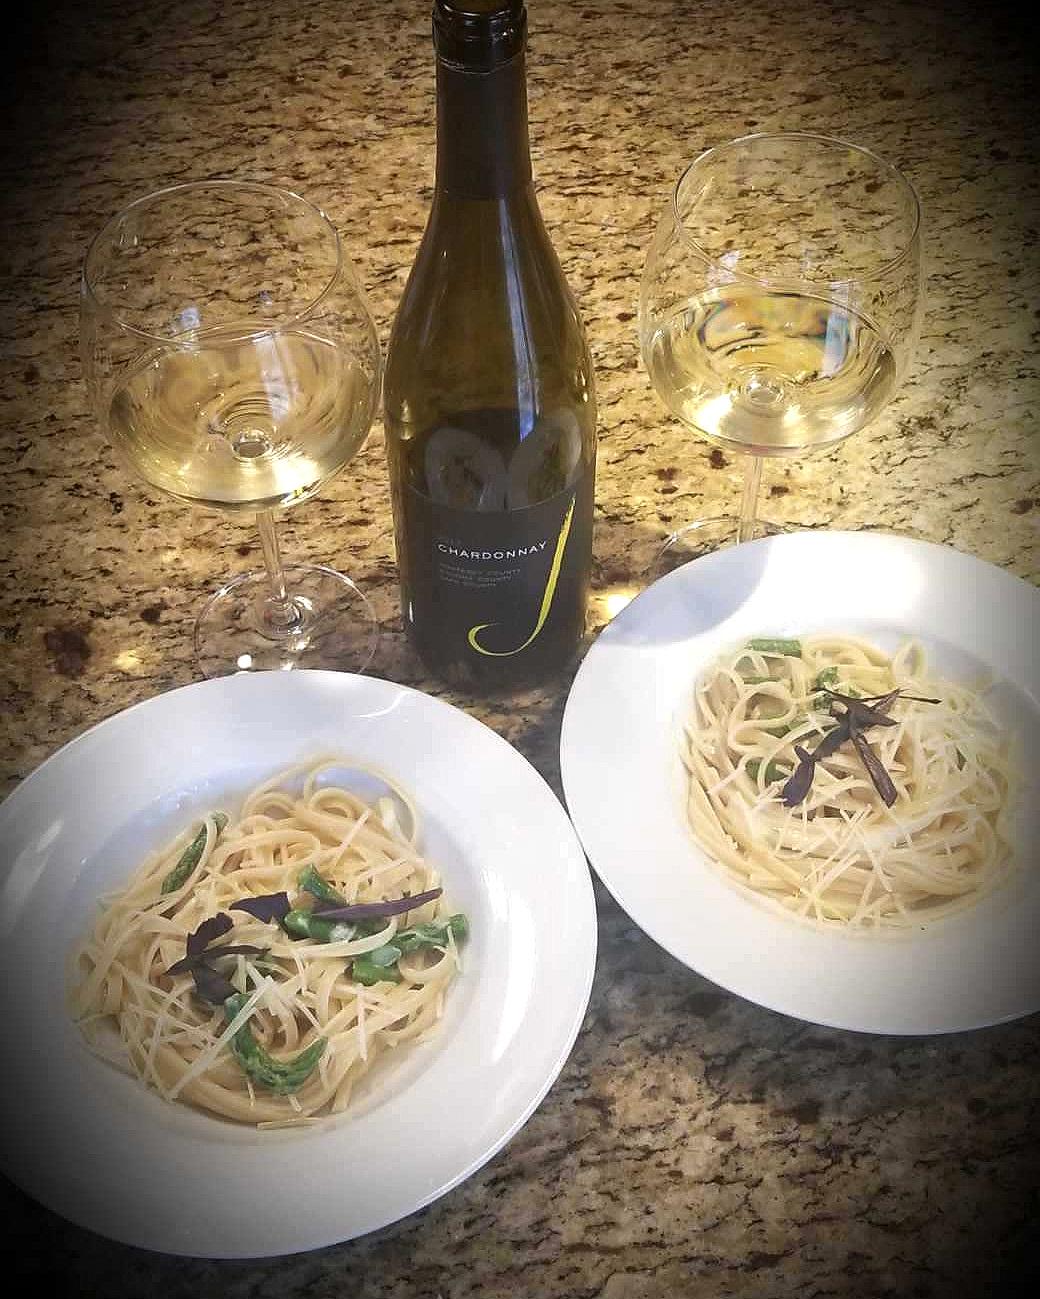 Drunken Lemon Cream Pasta w/Asparagus paired with J Vineyards Chardonnay